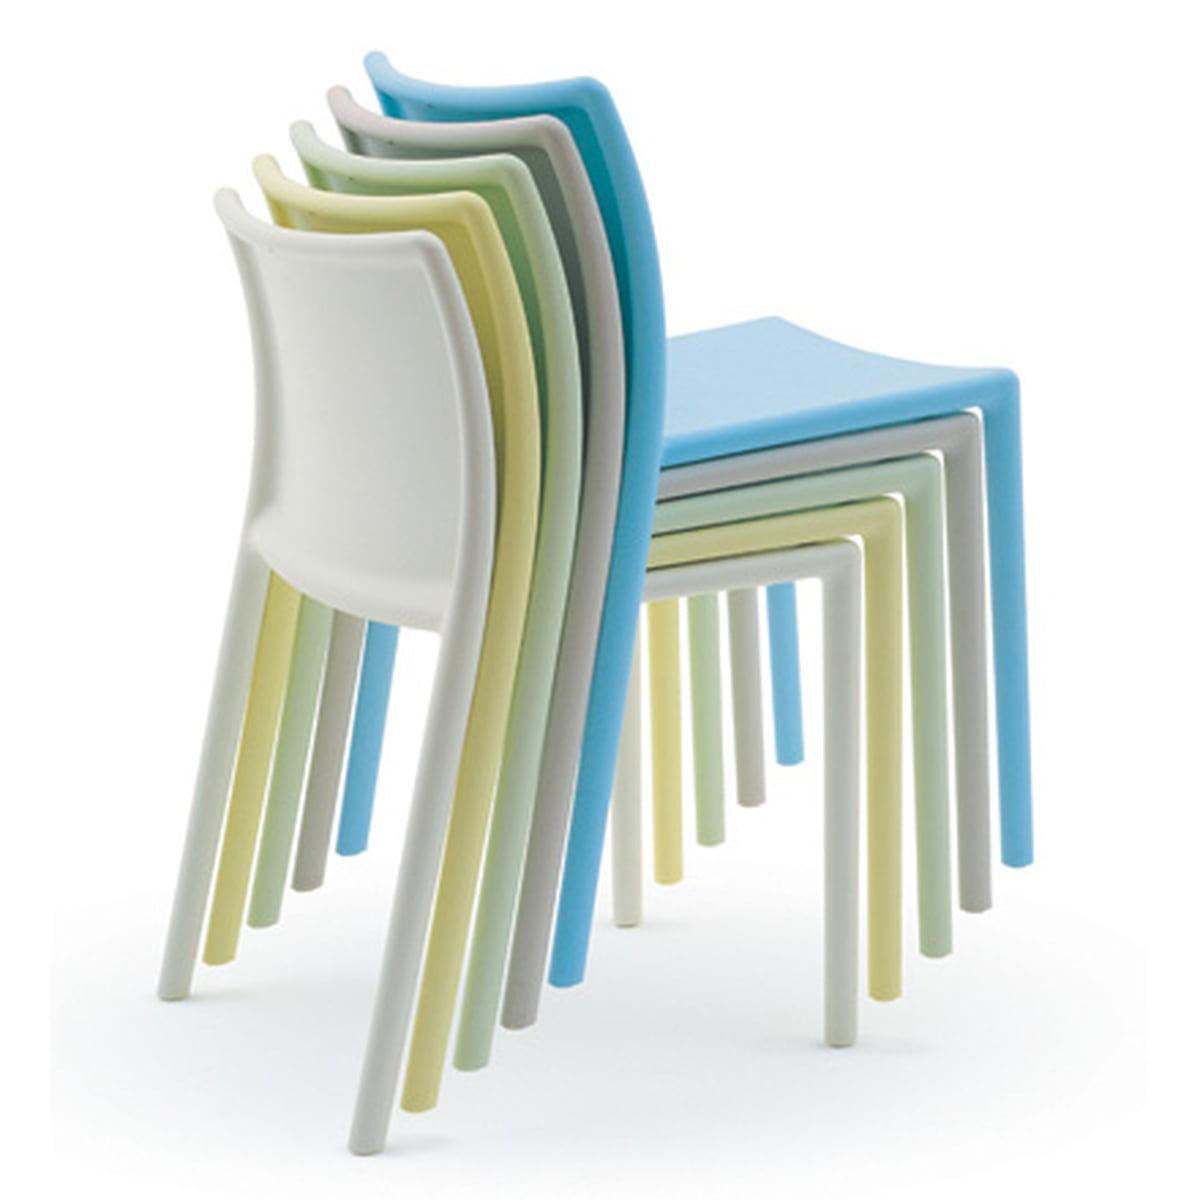 Air Chair By Magis In Our Shop